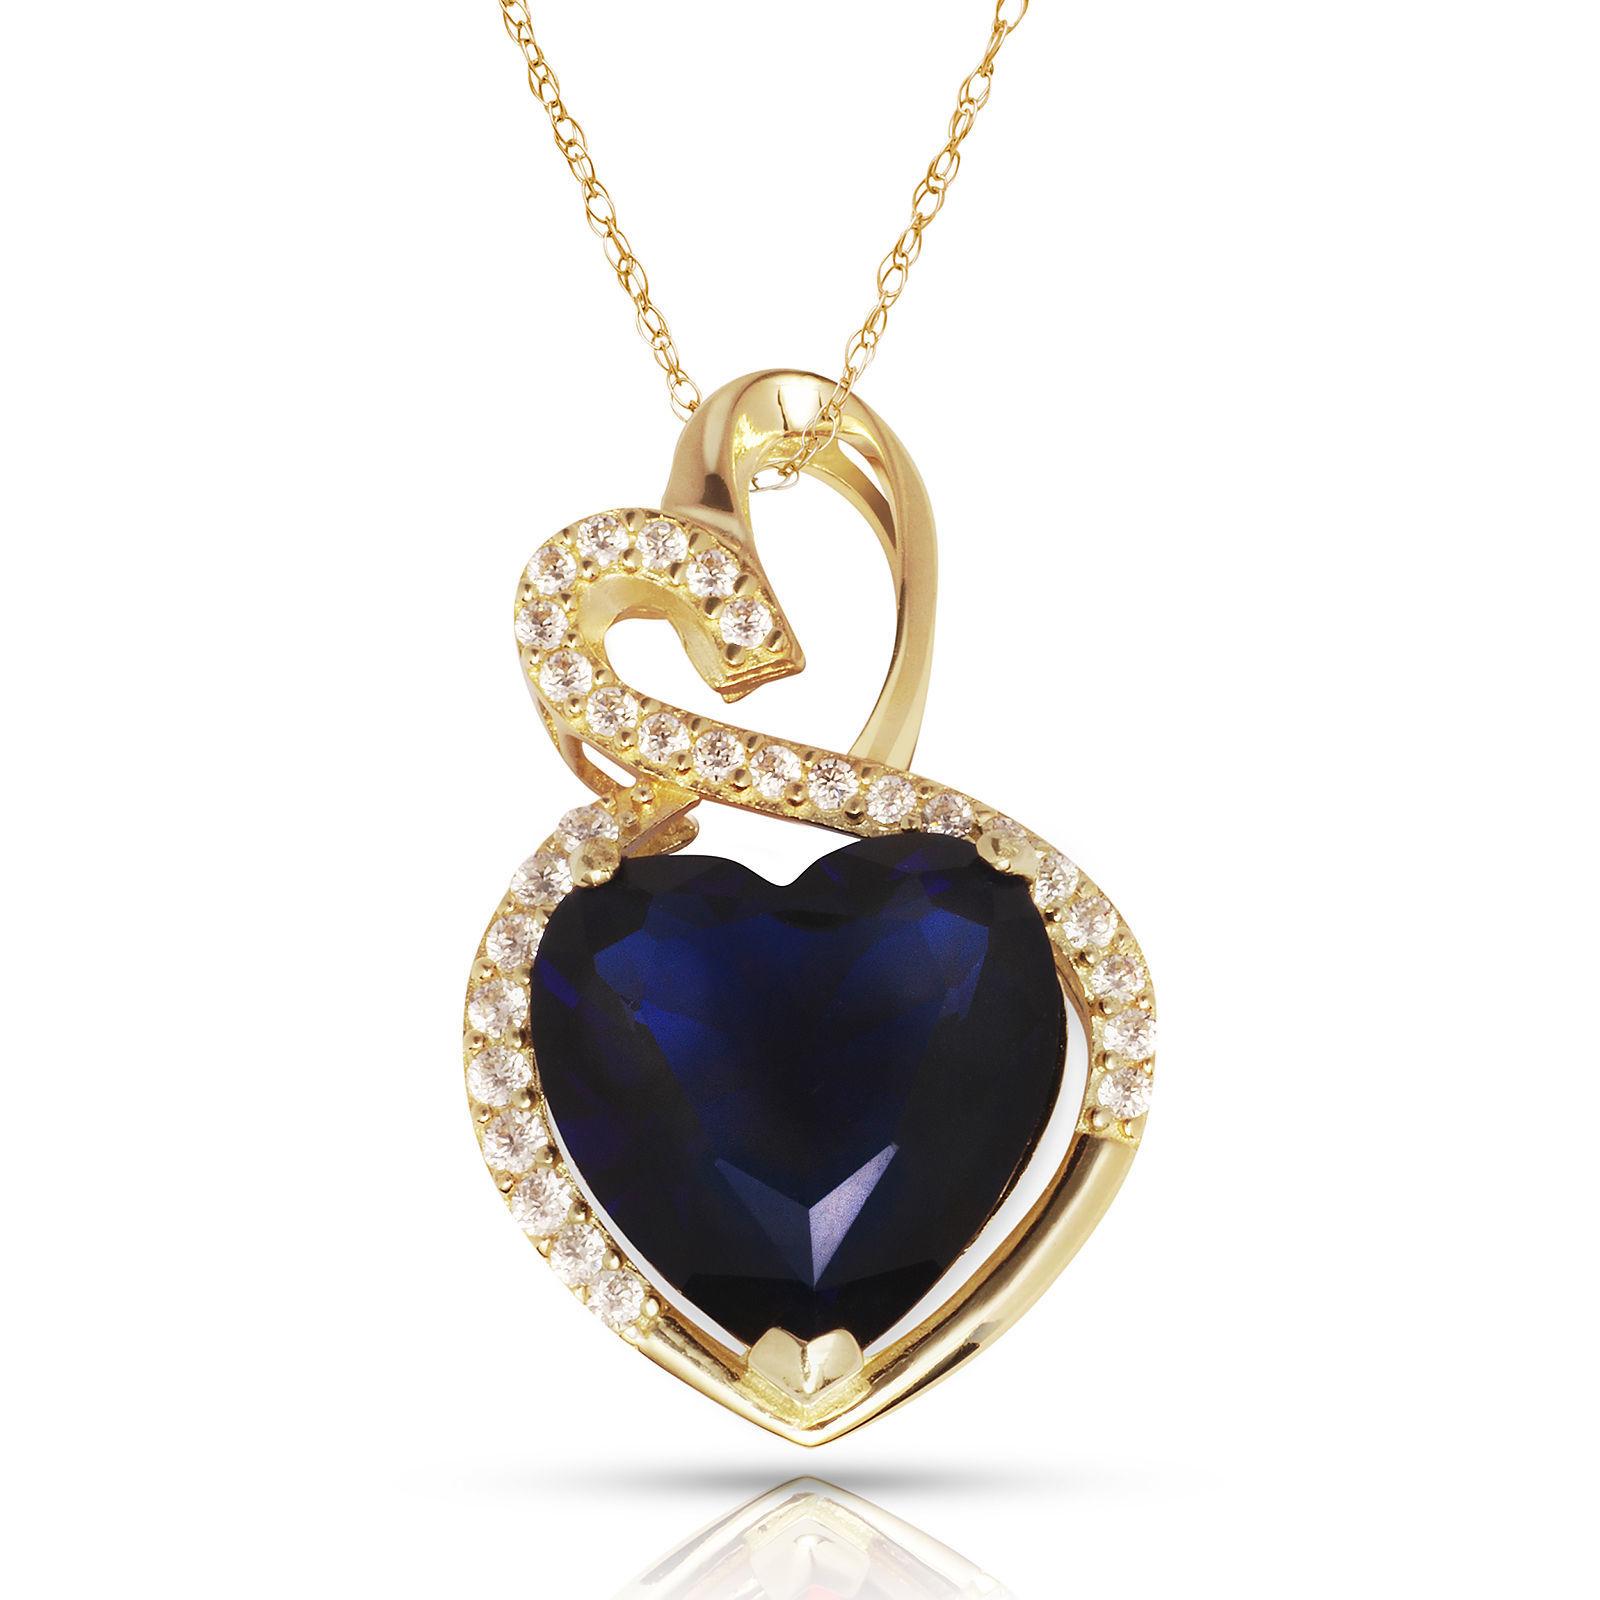 4.20 Carat Halo Sapphire Double Heart Gemstone Pendant & Necklace14K Yellow Gold